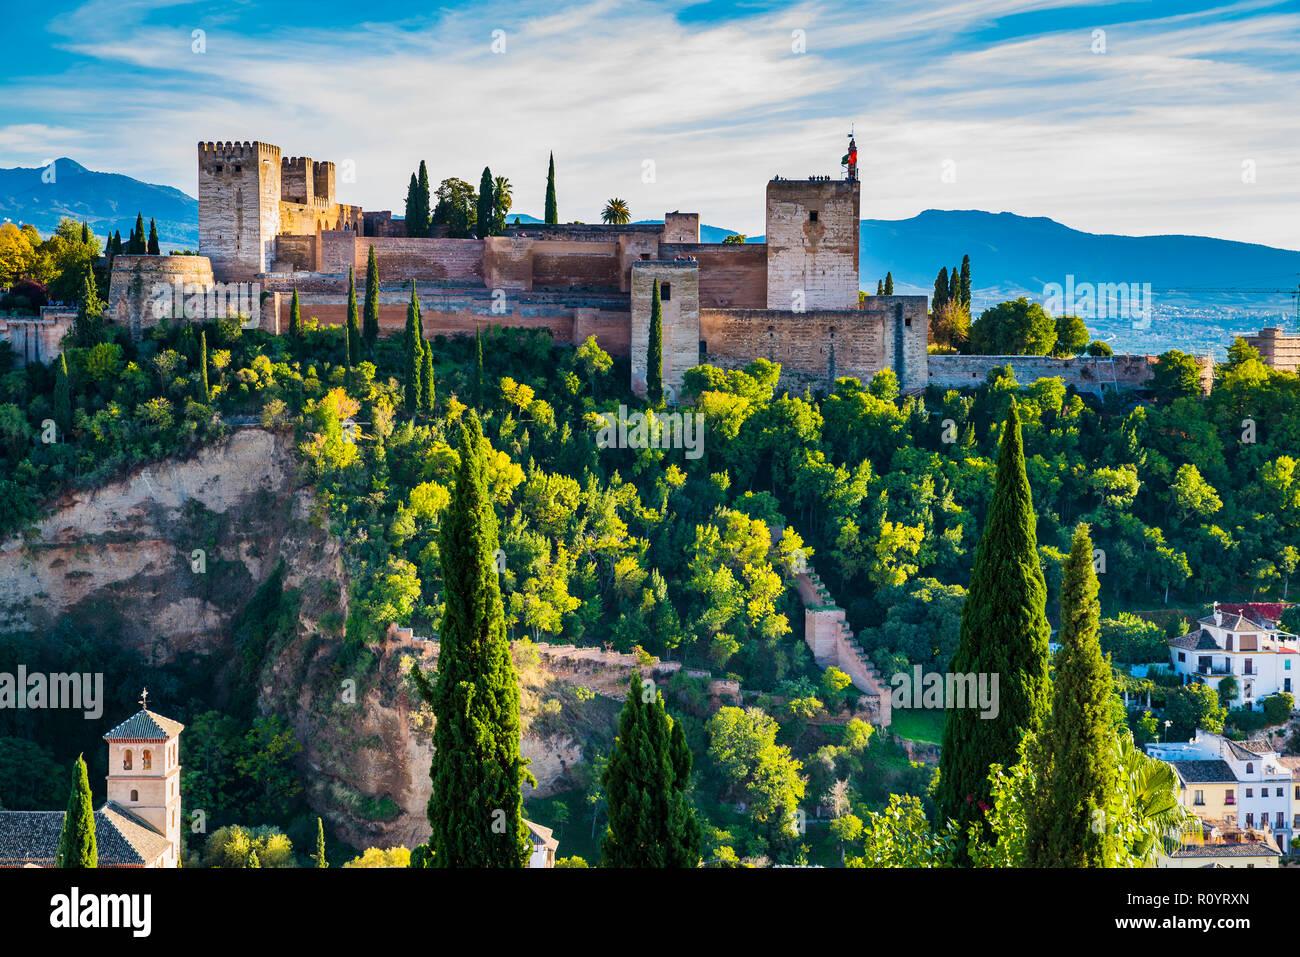 Alhambra. Alcazaba from Mirador de San Nicolas. Granada, Andalucia, Spain, Europe. - Stock Image